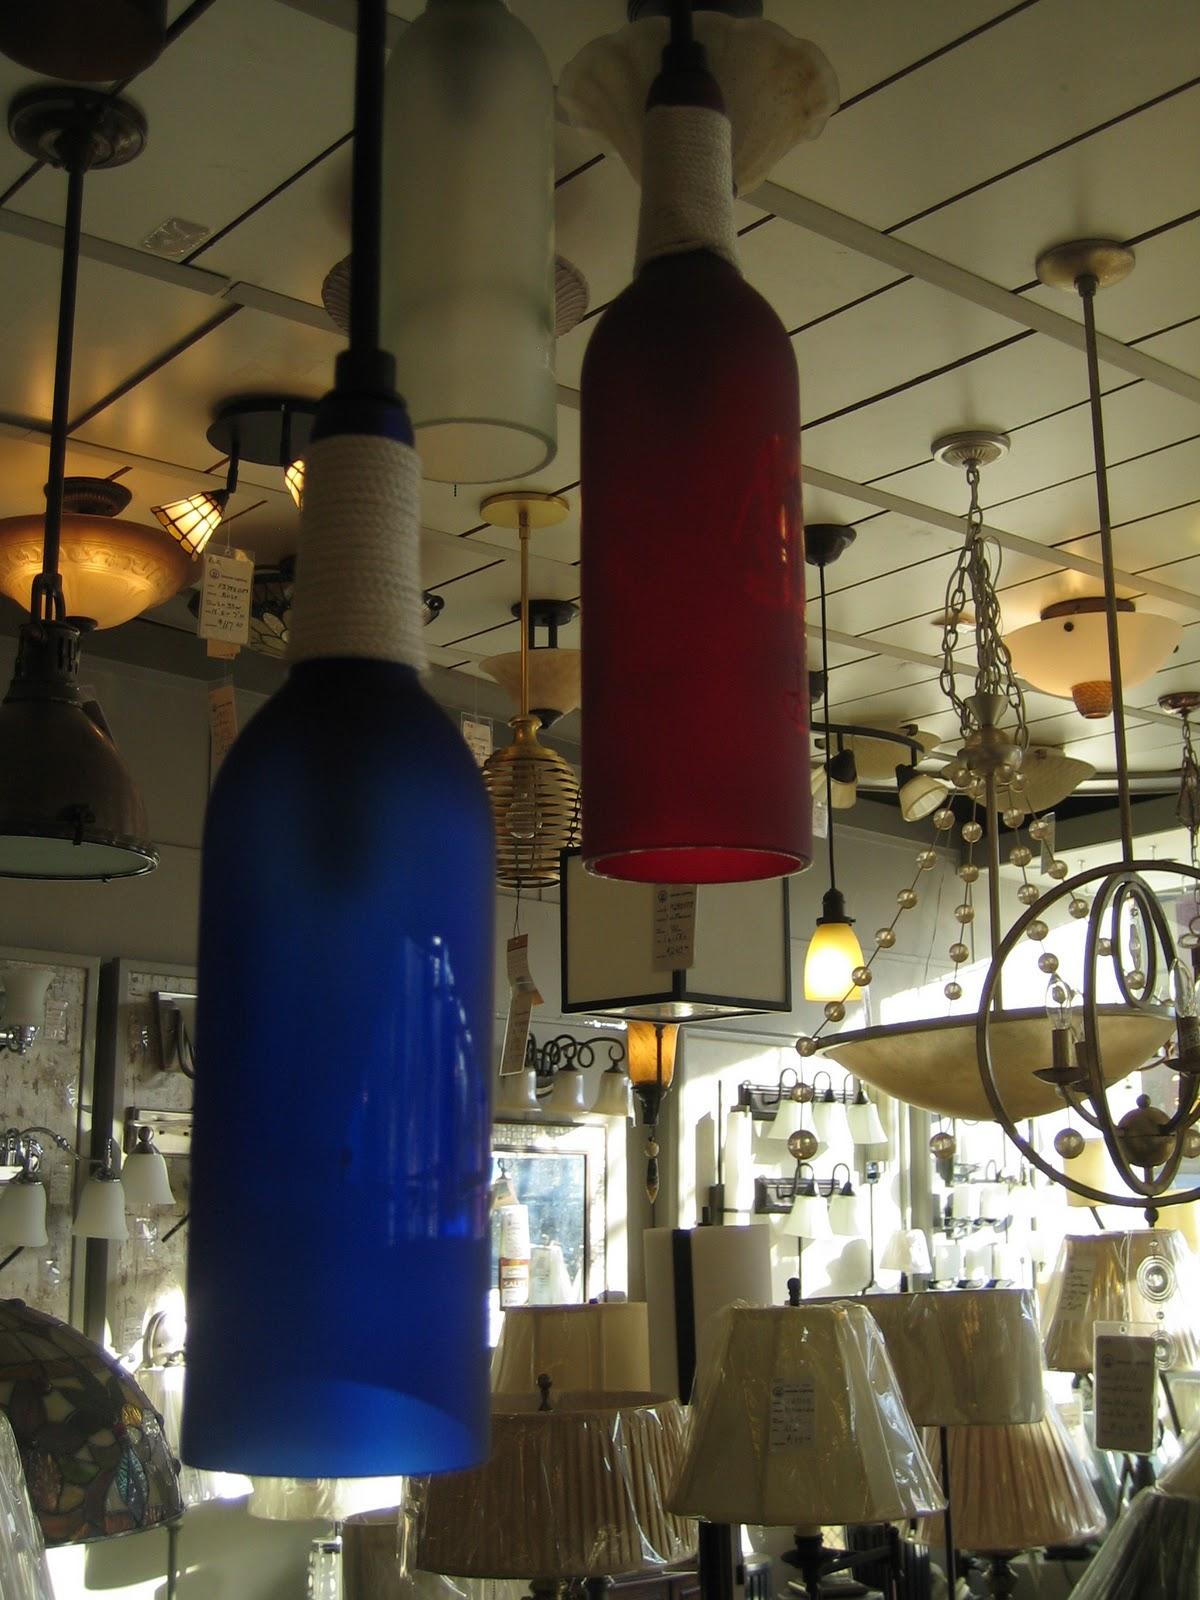 Denise 39 S Press Fractions Wine Blog Finding Wine In Salem MA